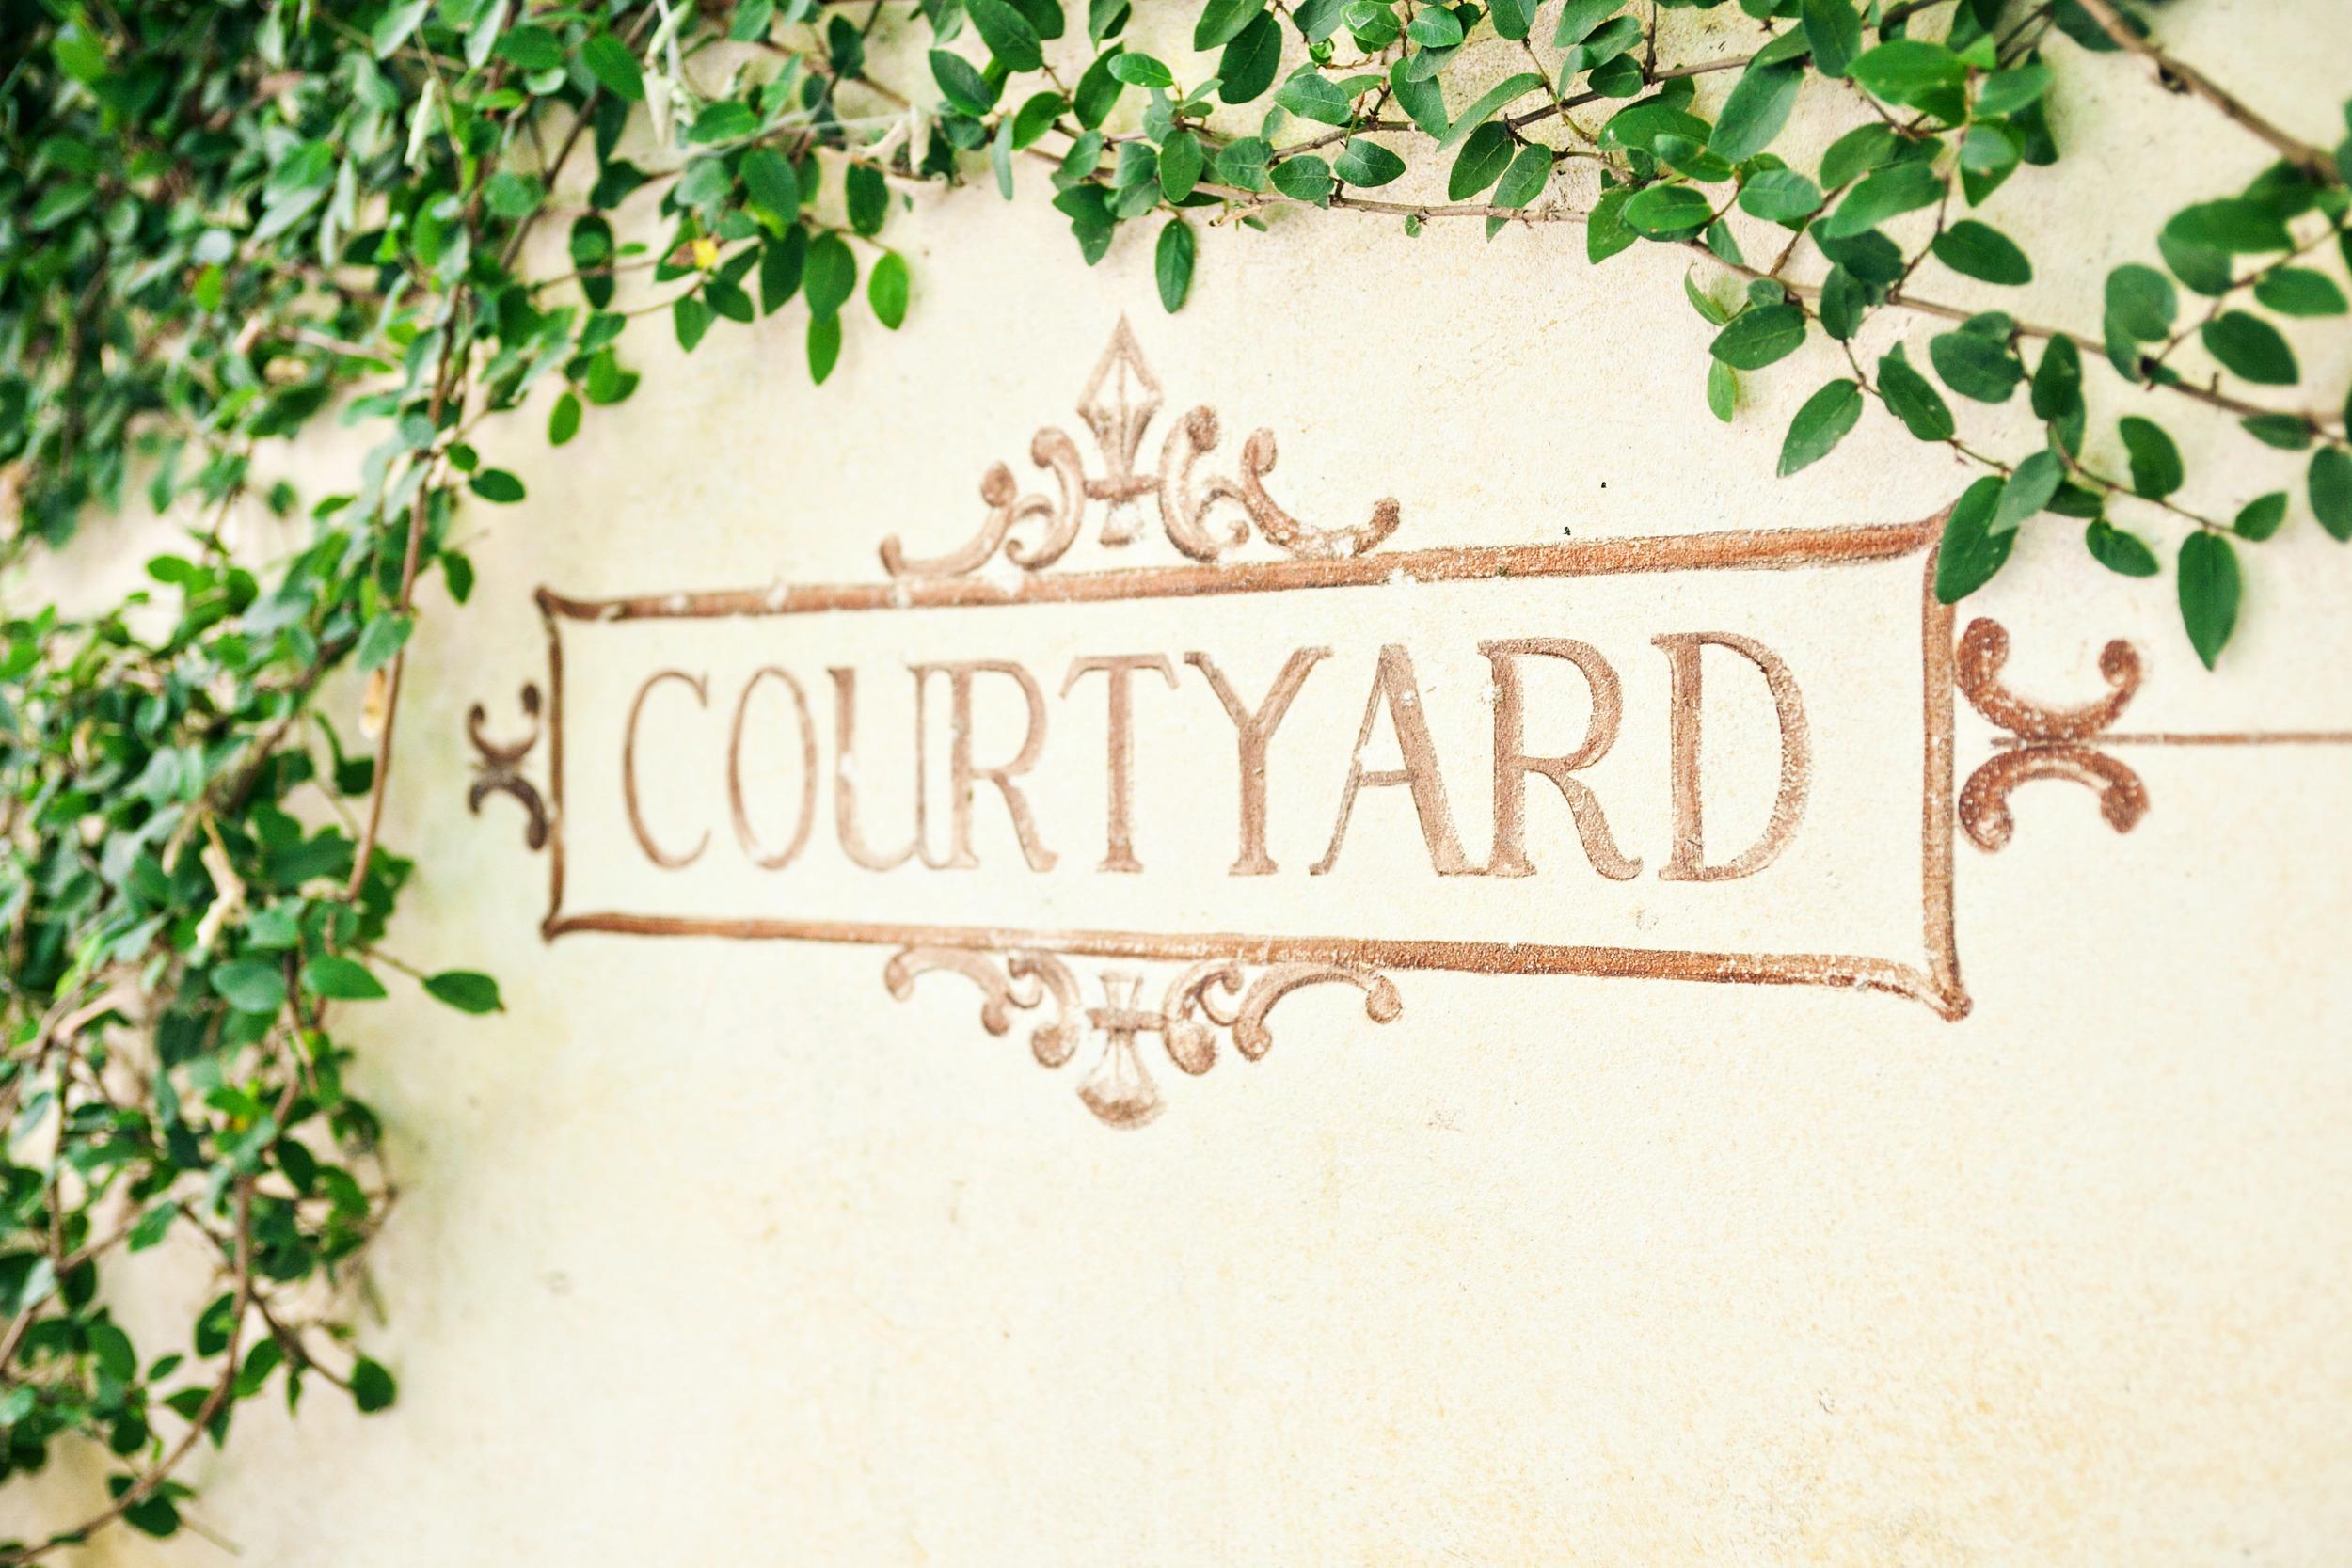 N Courtyard .jpg